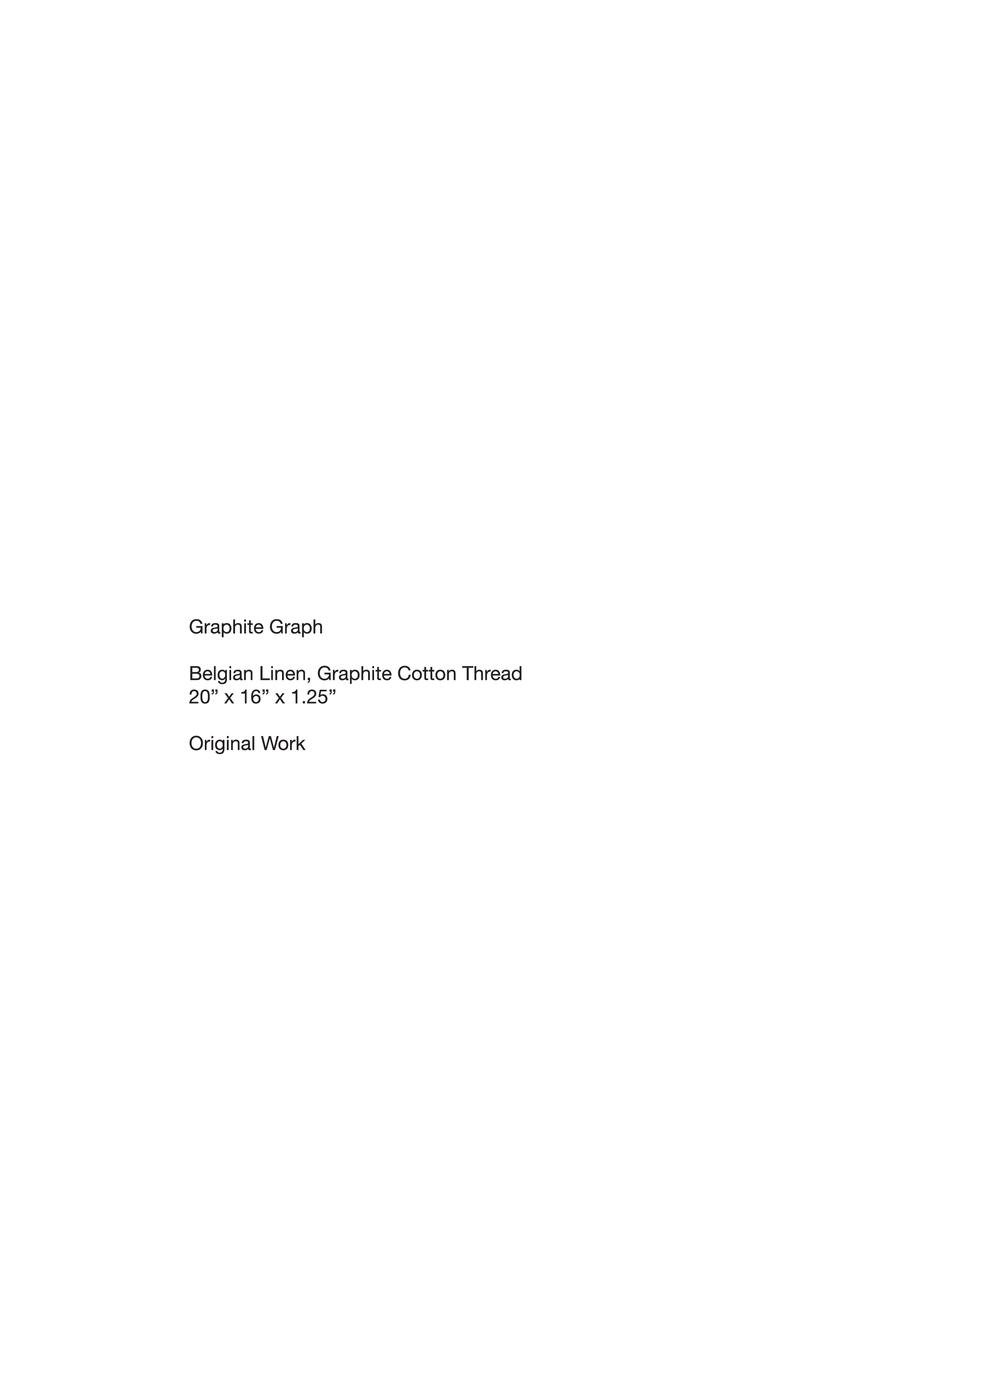 Nicole Patel Graphite Graph Text-01.png